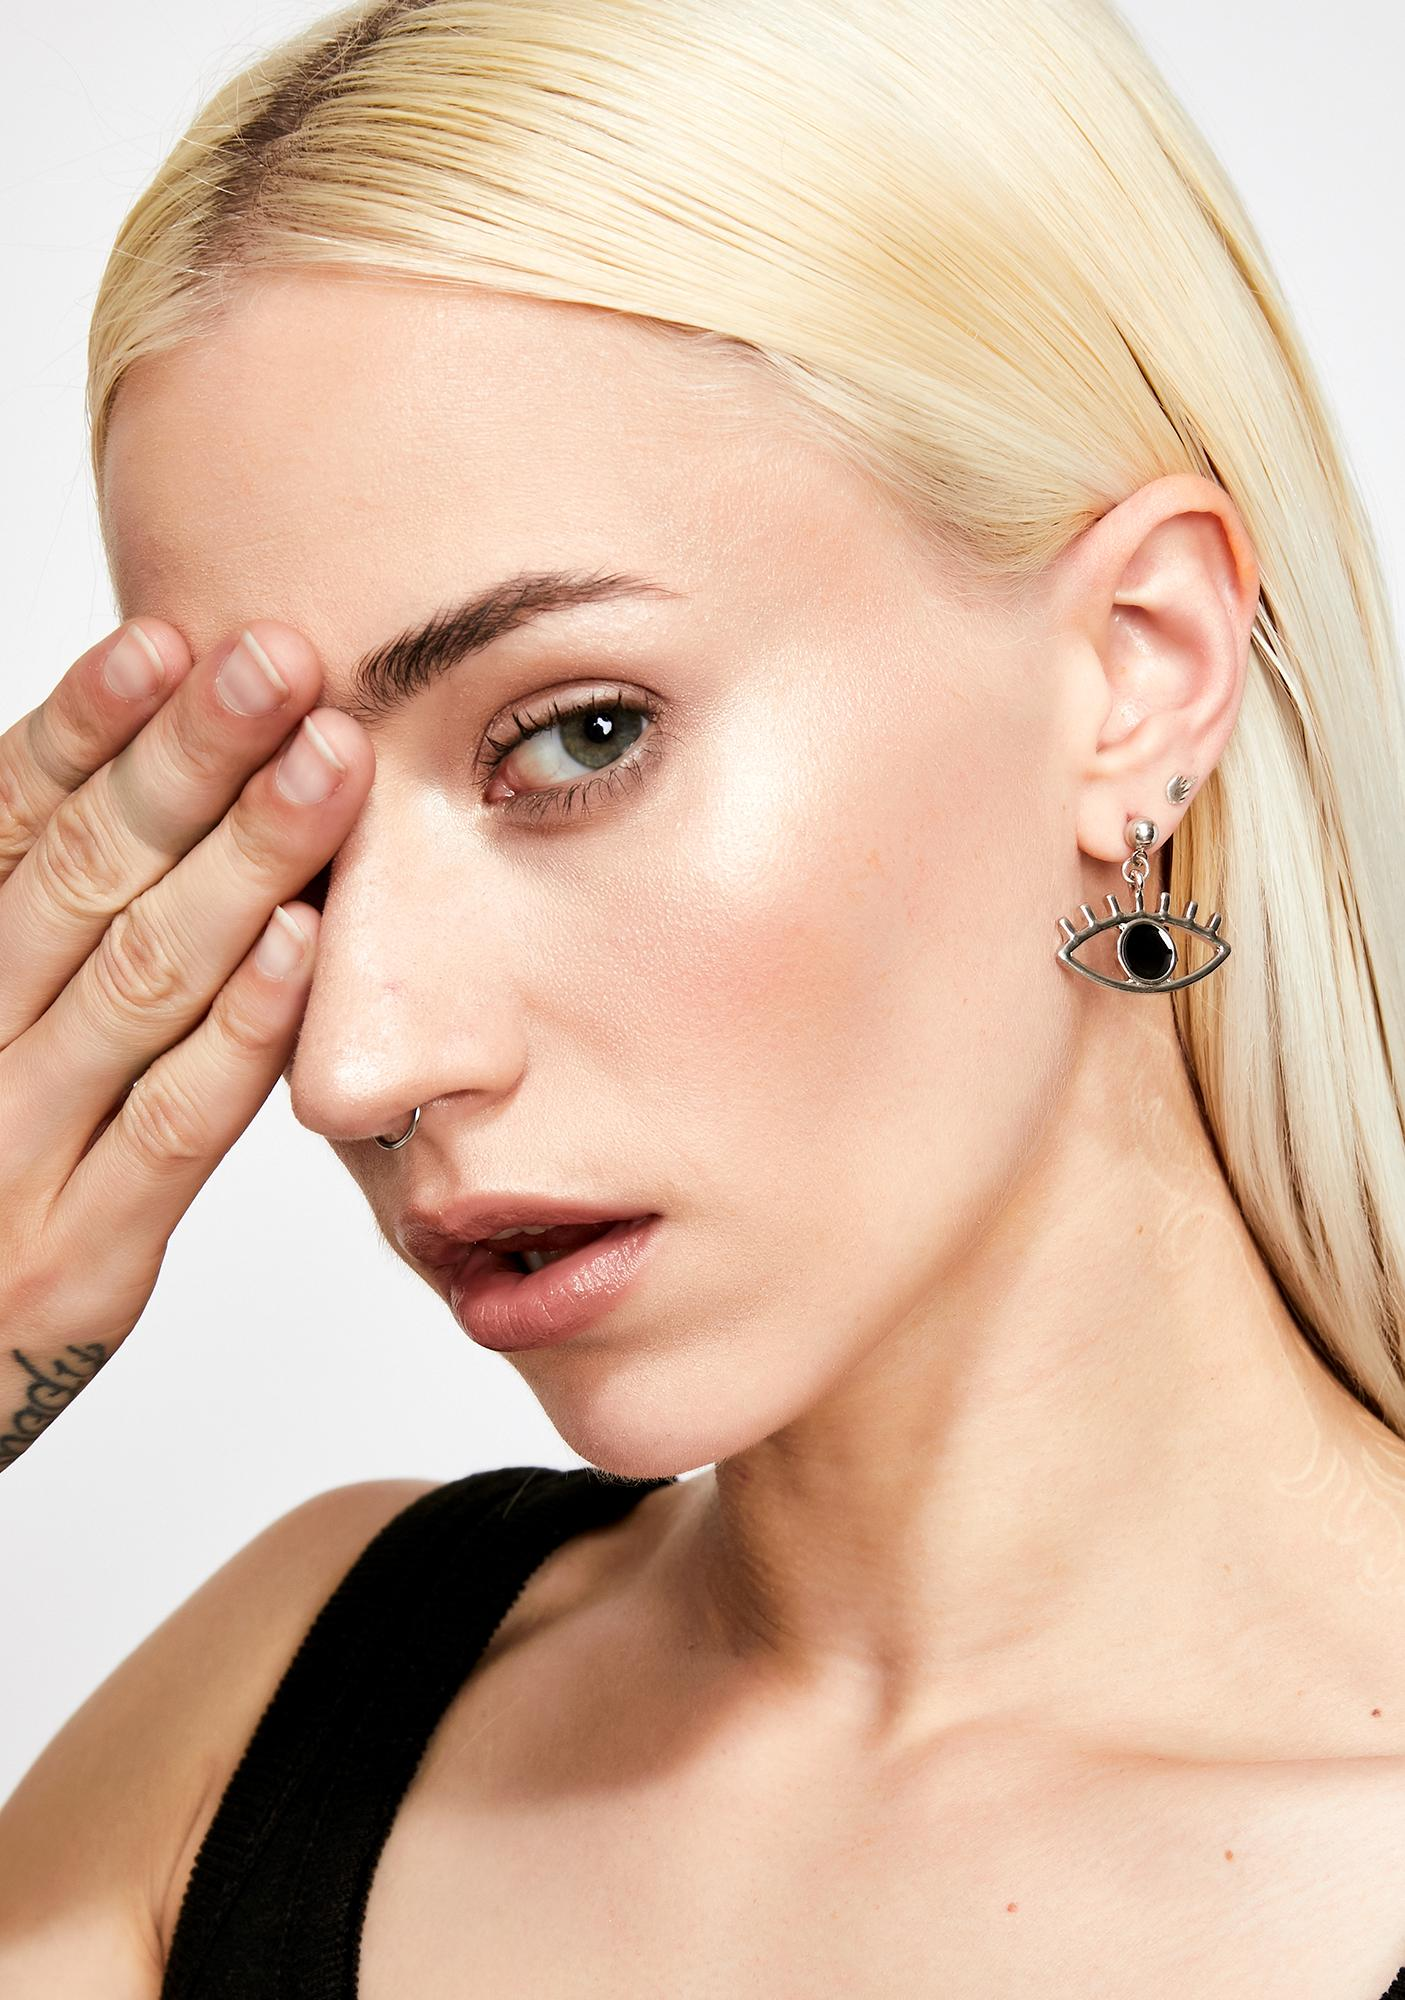 Illuminaughty Eye Earrings